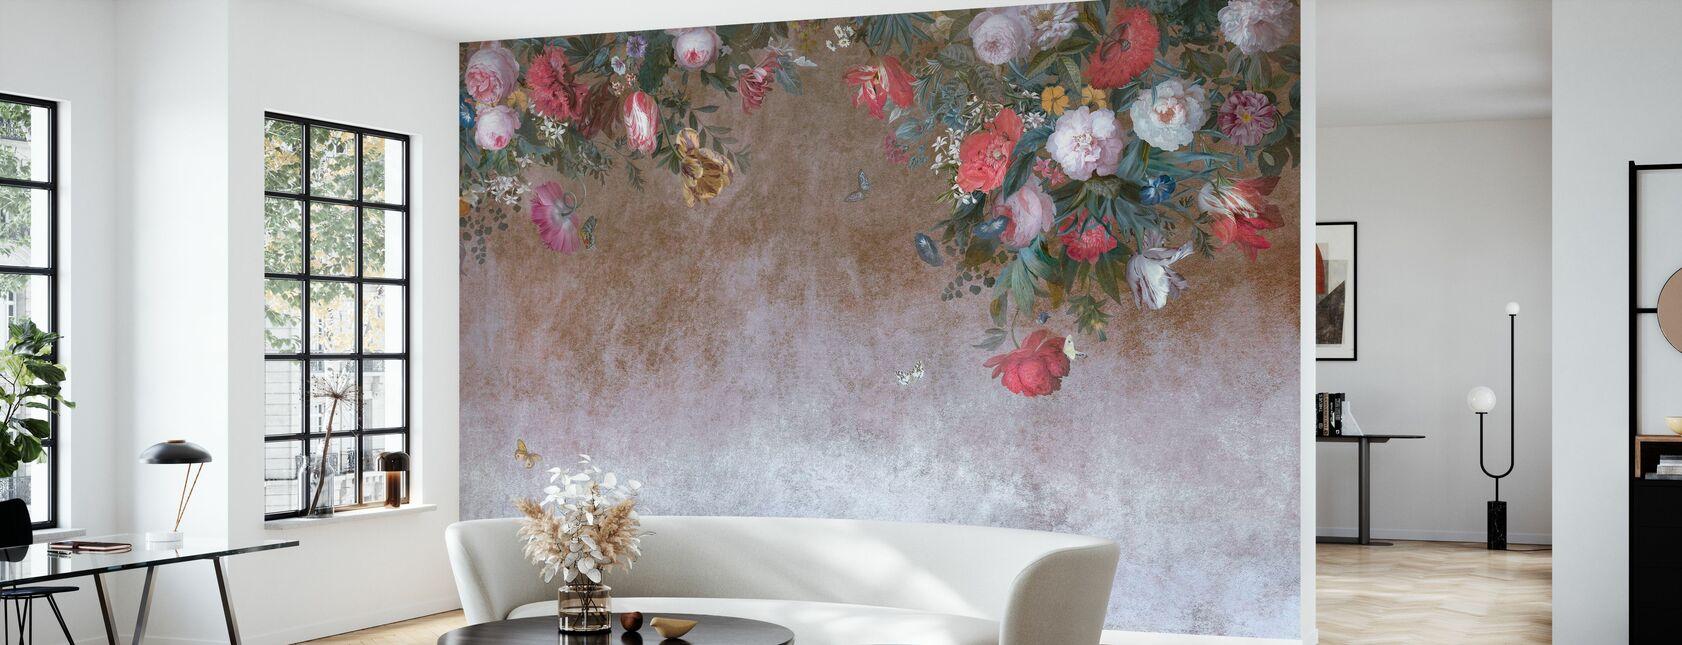 Flower Grunge Wall - Wallpaper - Living Room